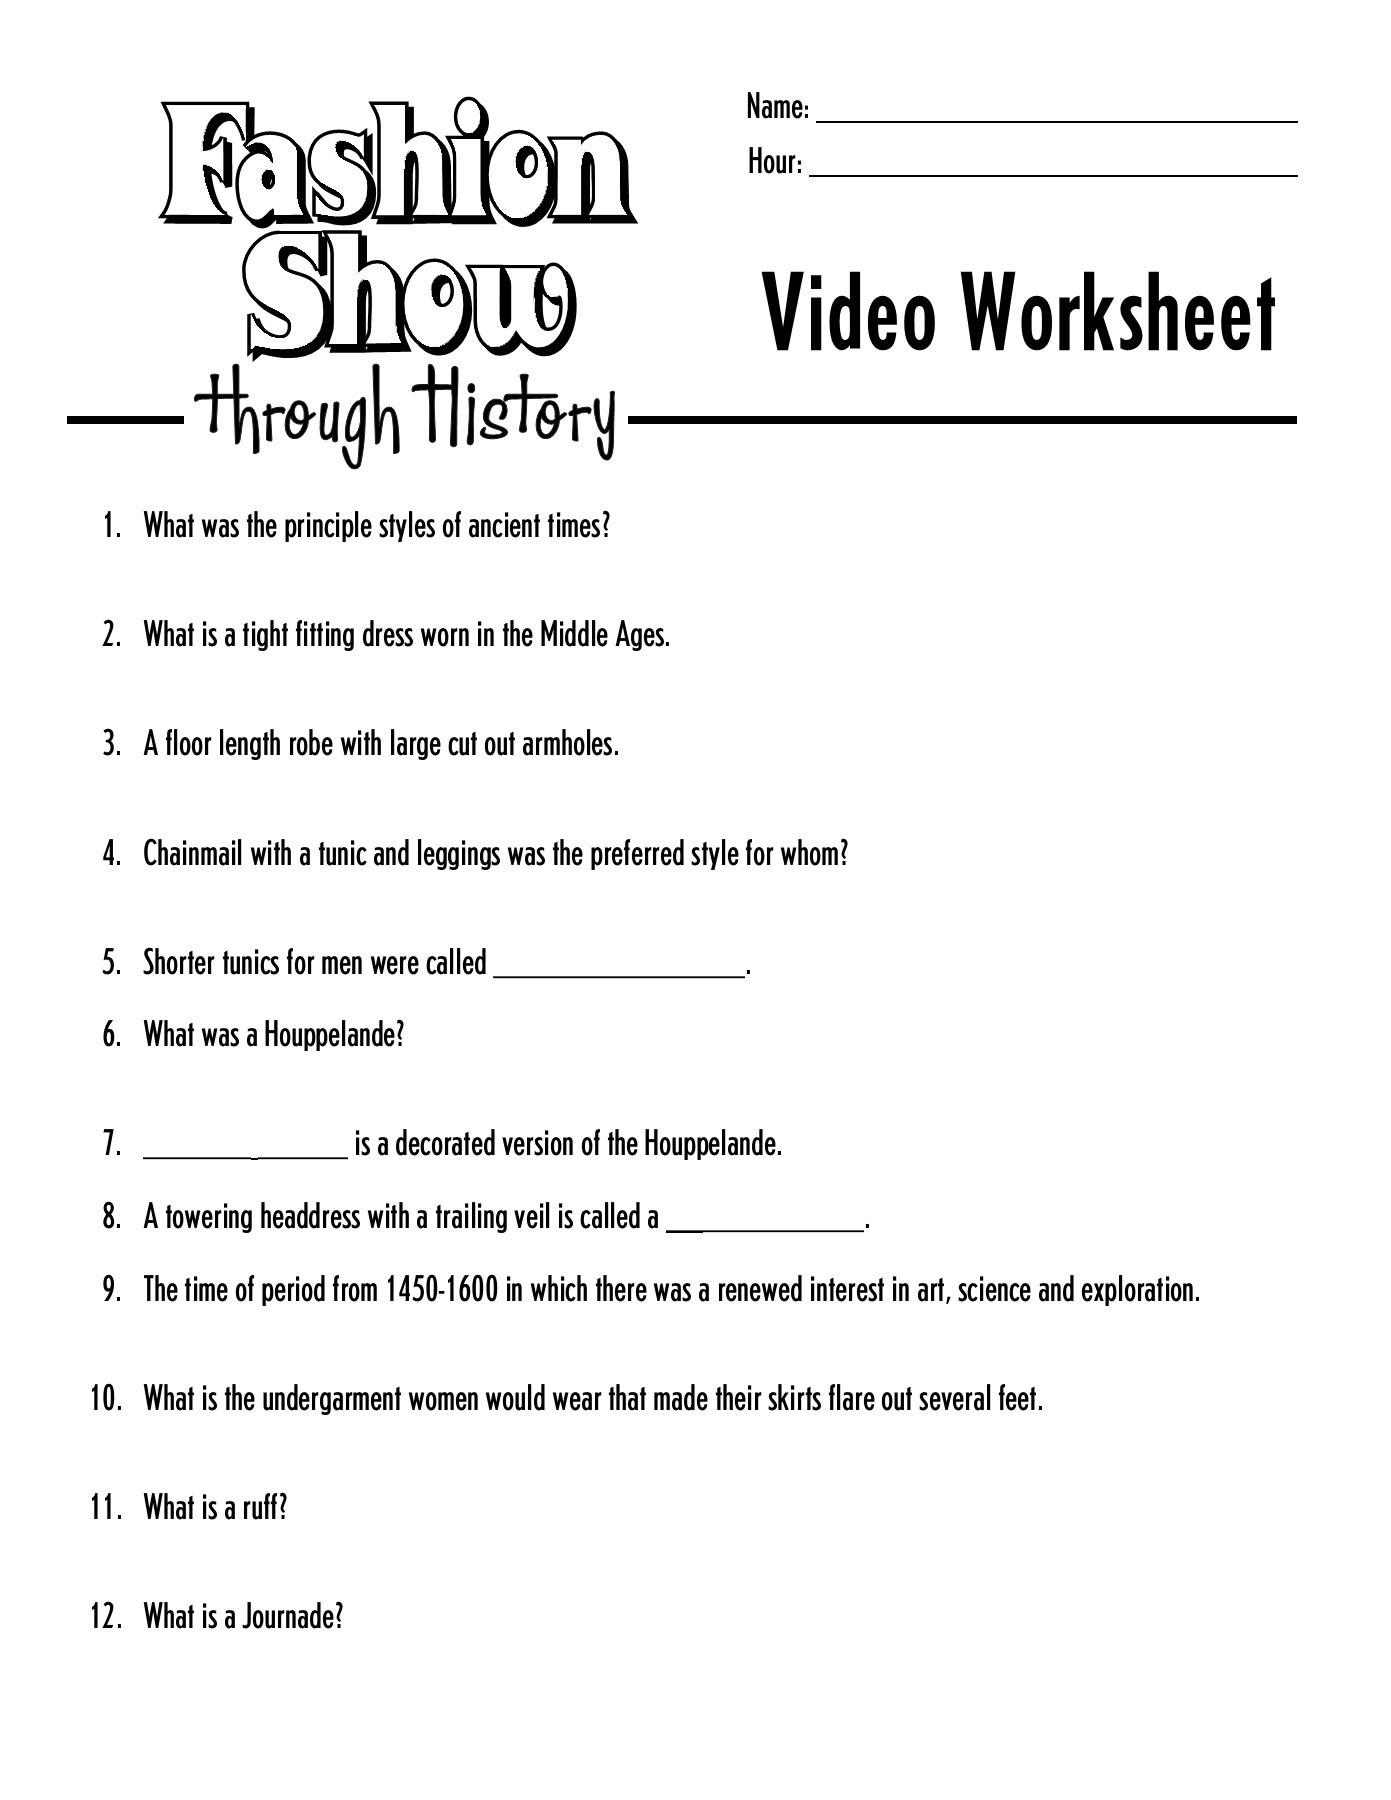 Learning Zonexpress Worksheet Answers - Worksheet List